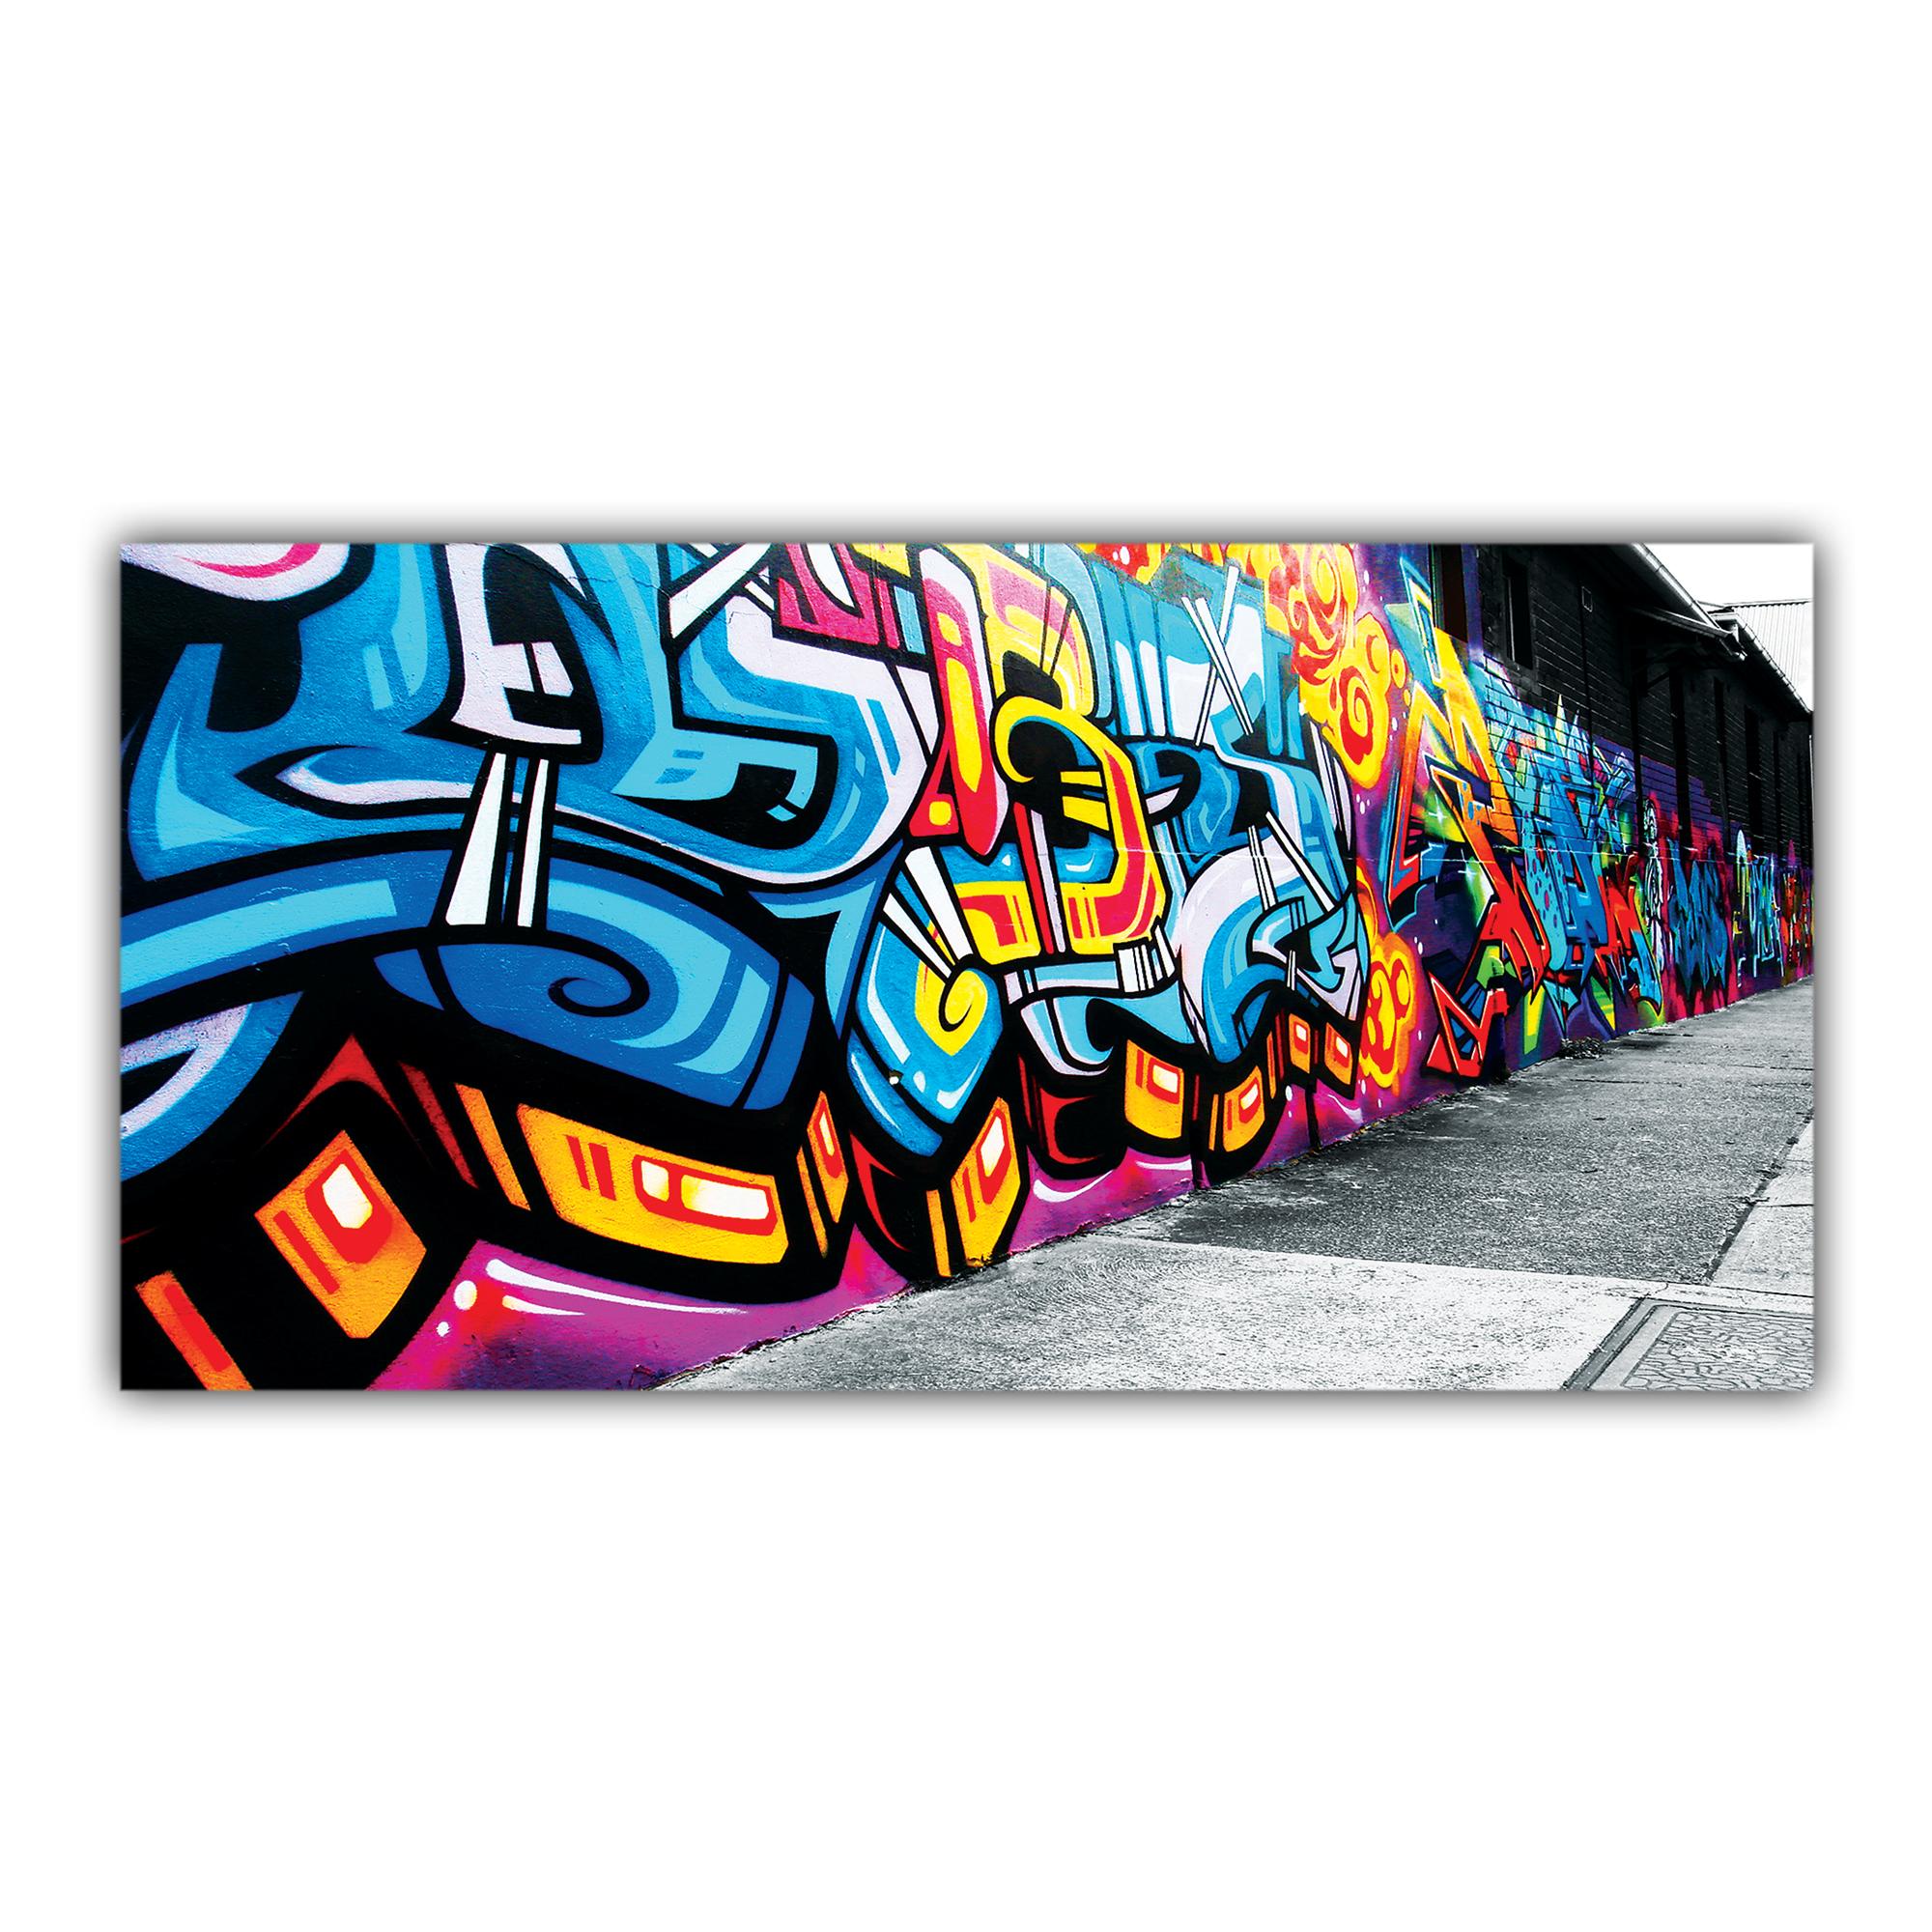 Graffiti Couleurs de Rue